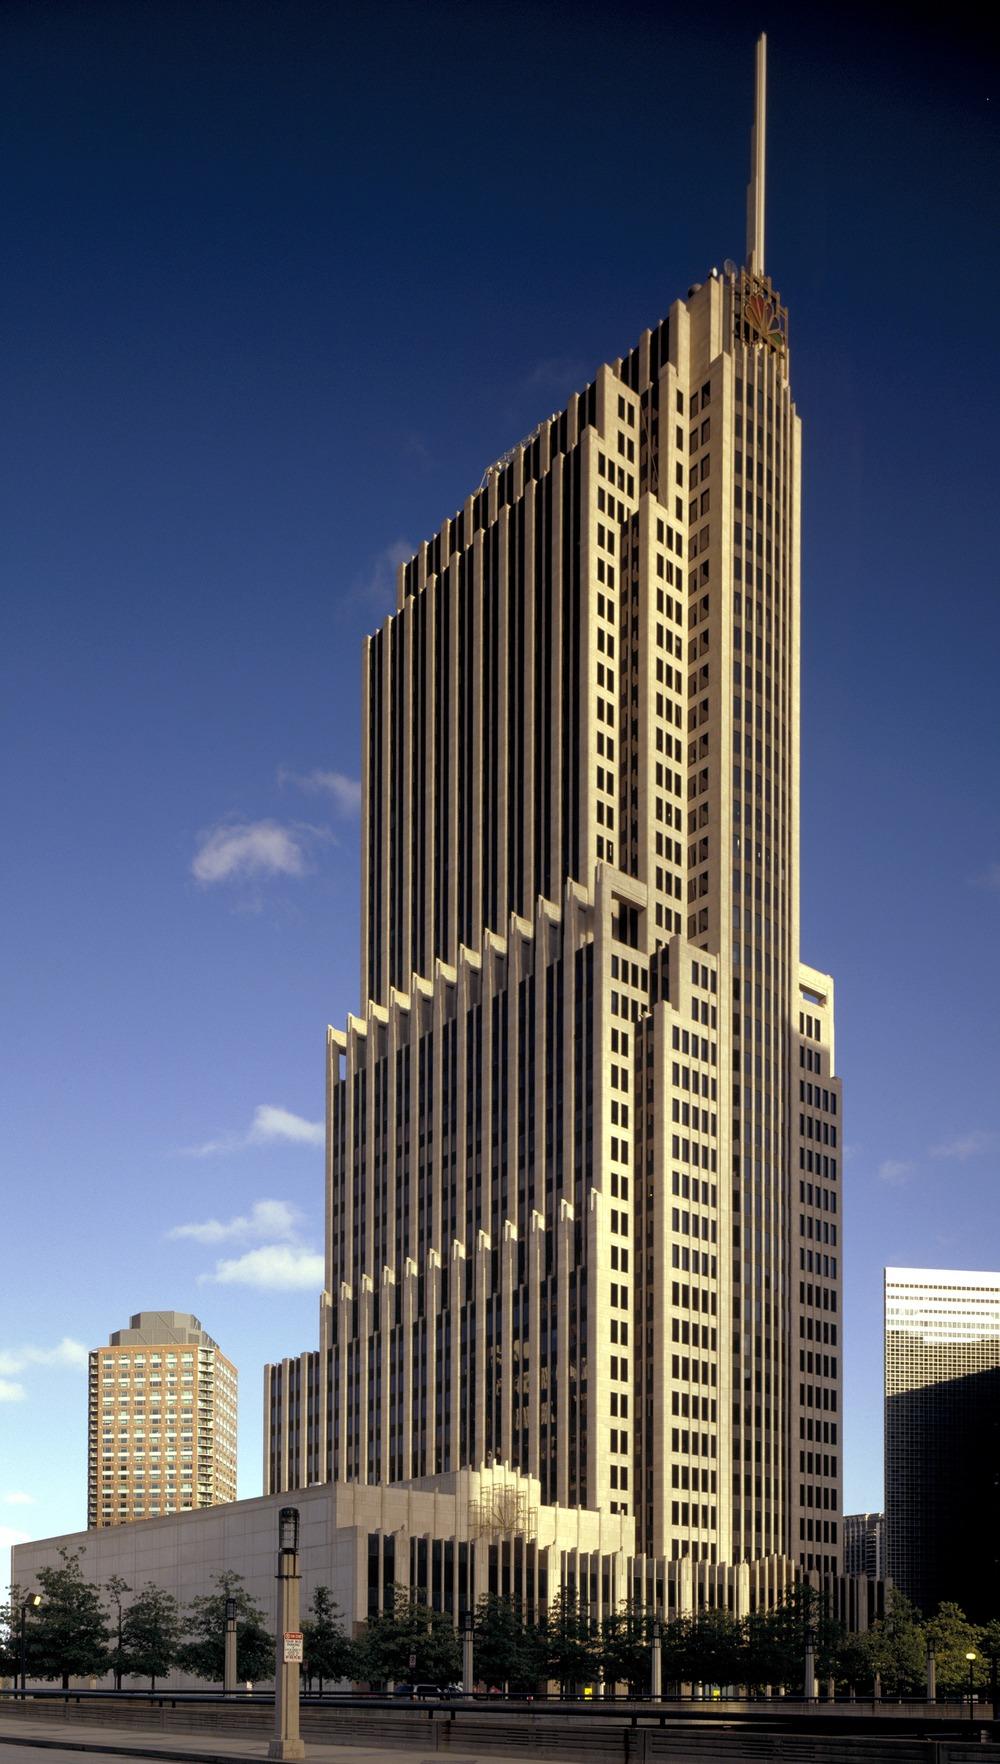 455 N. Cityfront Plaza Drive - Chicago - IL